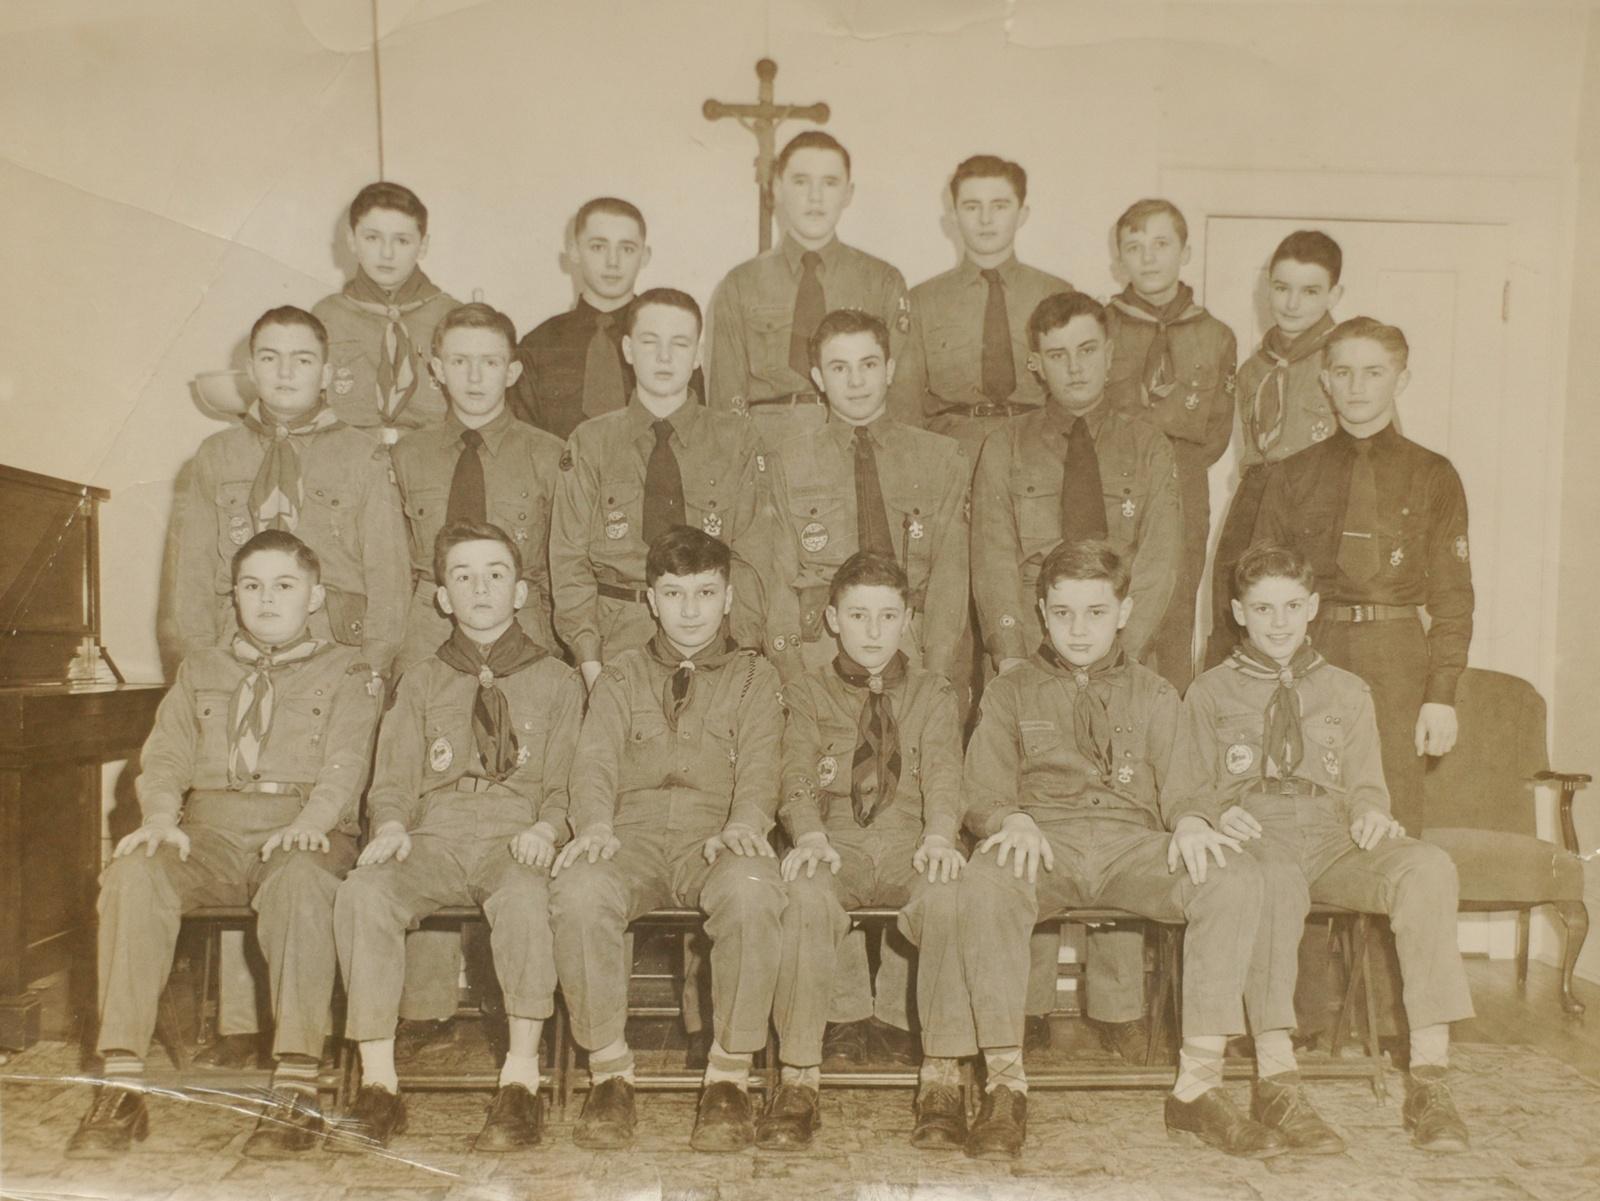 fd - history - 28